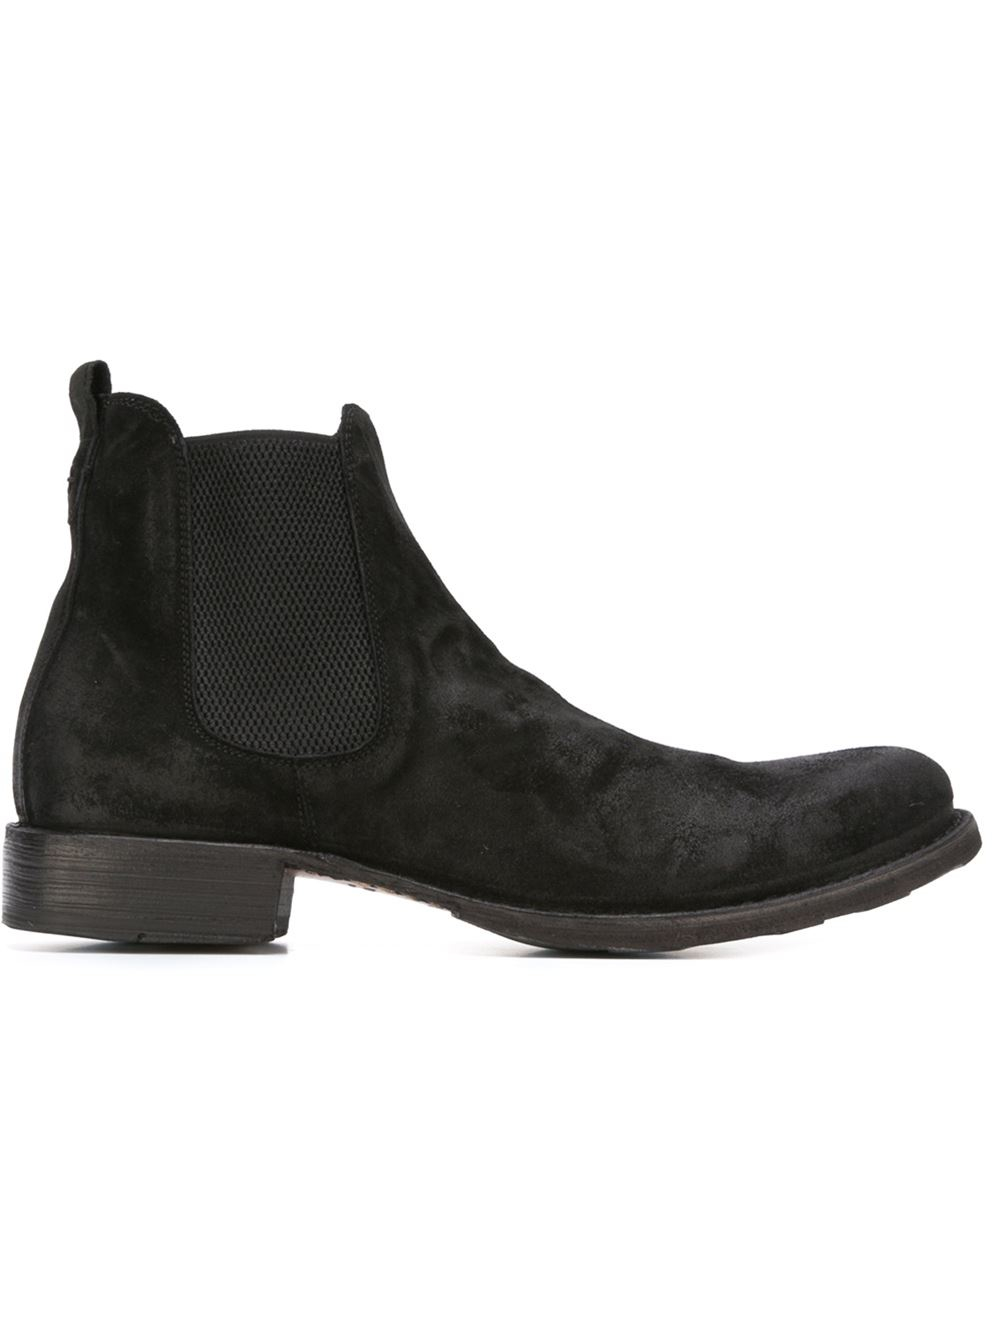 fiorentini baker 39 eternity etex 39 boots in black for men. Black Bedroom Furniture Sets. Home Design Ideas